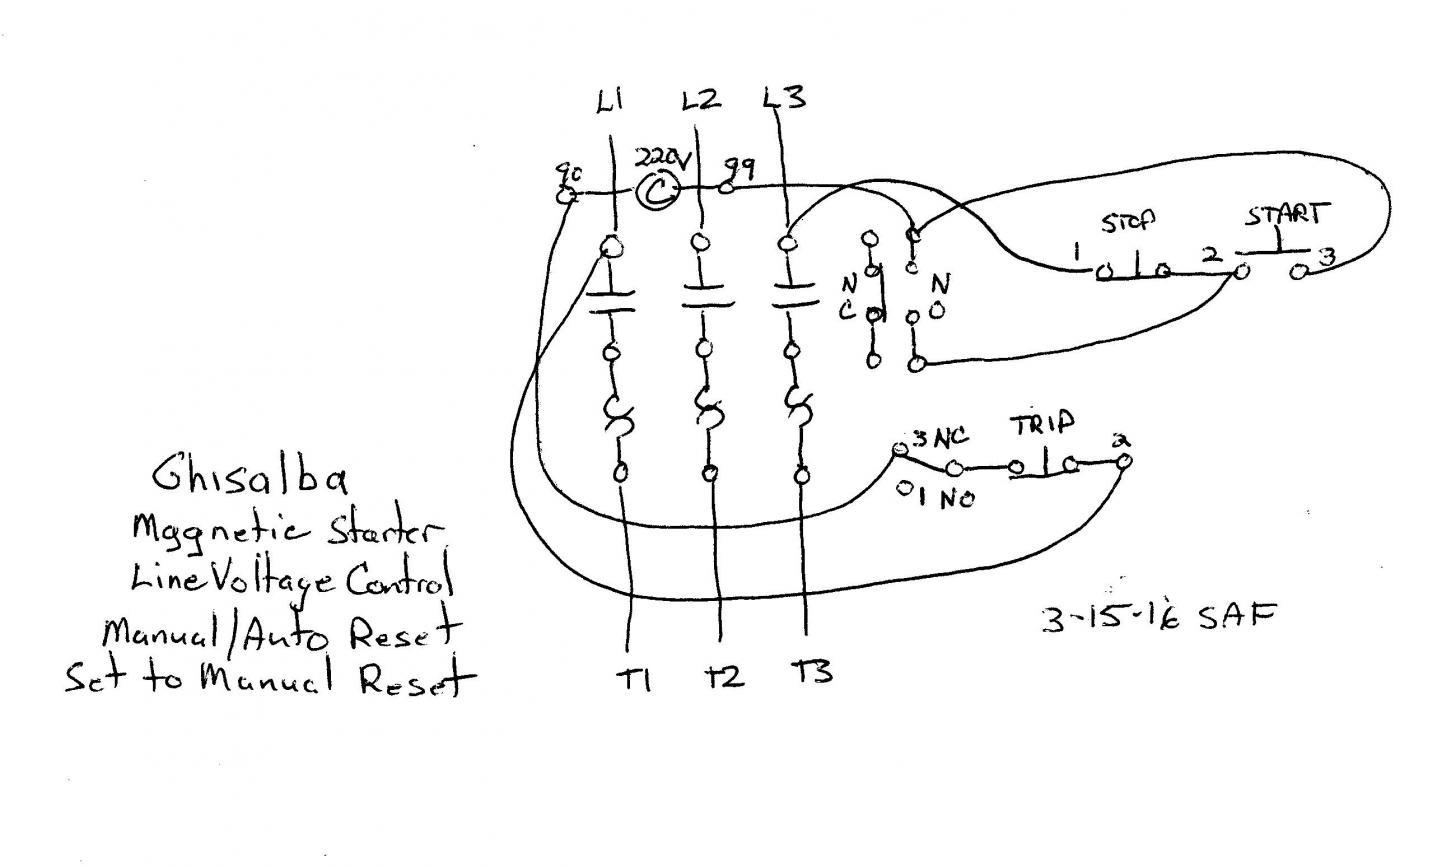 Arduino Code For Motor Wiring Diagram Ponents  sc 1 st  Wiring Diagram : 3 phase start stop wiring diagram - yogabreezes.com